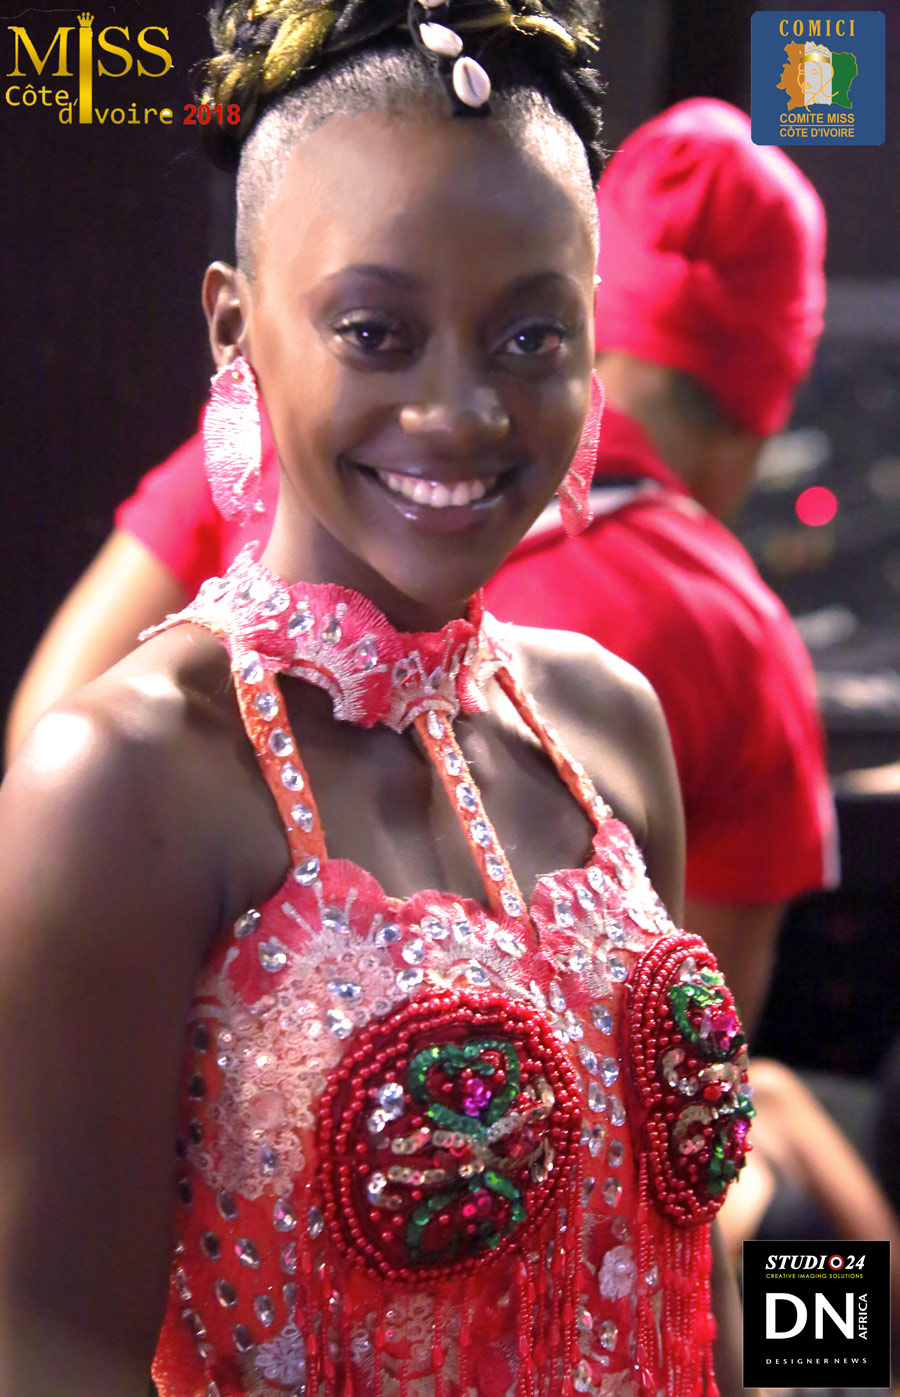 AFRICAN FASHION STYLE MAGAZINE - MISS IVORY COAST 2018 - MISS MARIE-DANIELLE SUY FATEM BEST ALBUM BACKSTAGE - DN AFRICA - STUDIO 24 NIGERIA